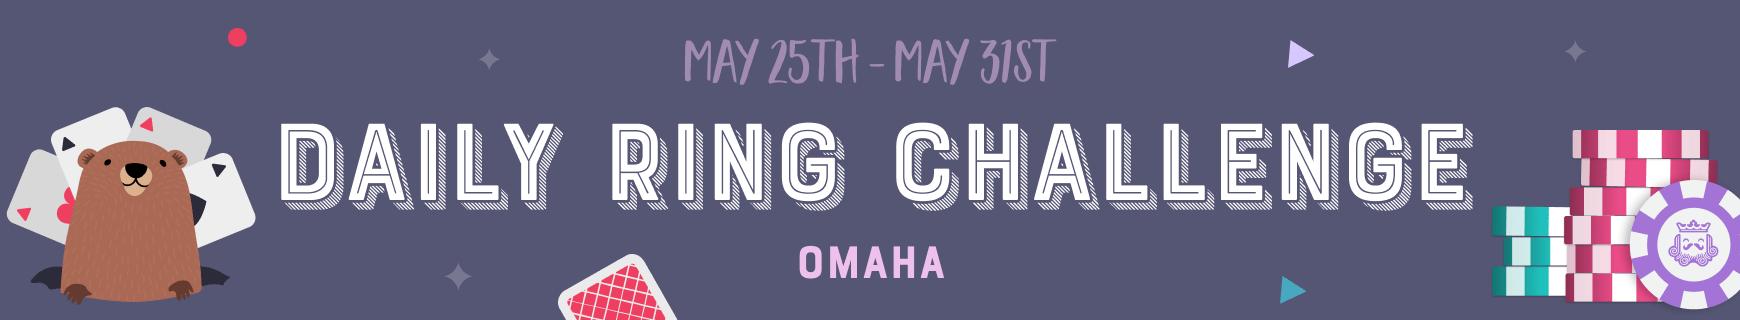 Daily ring challenge   omaha   dashboard %28870 x 160%29 2x